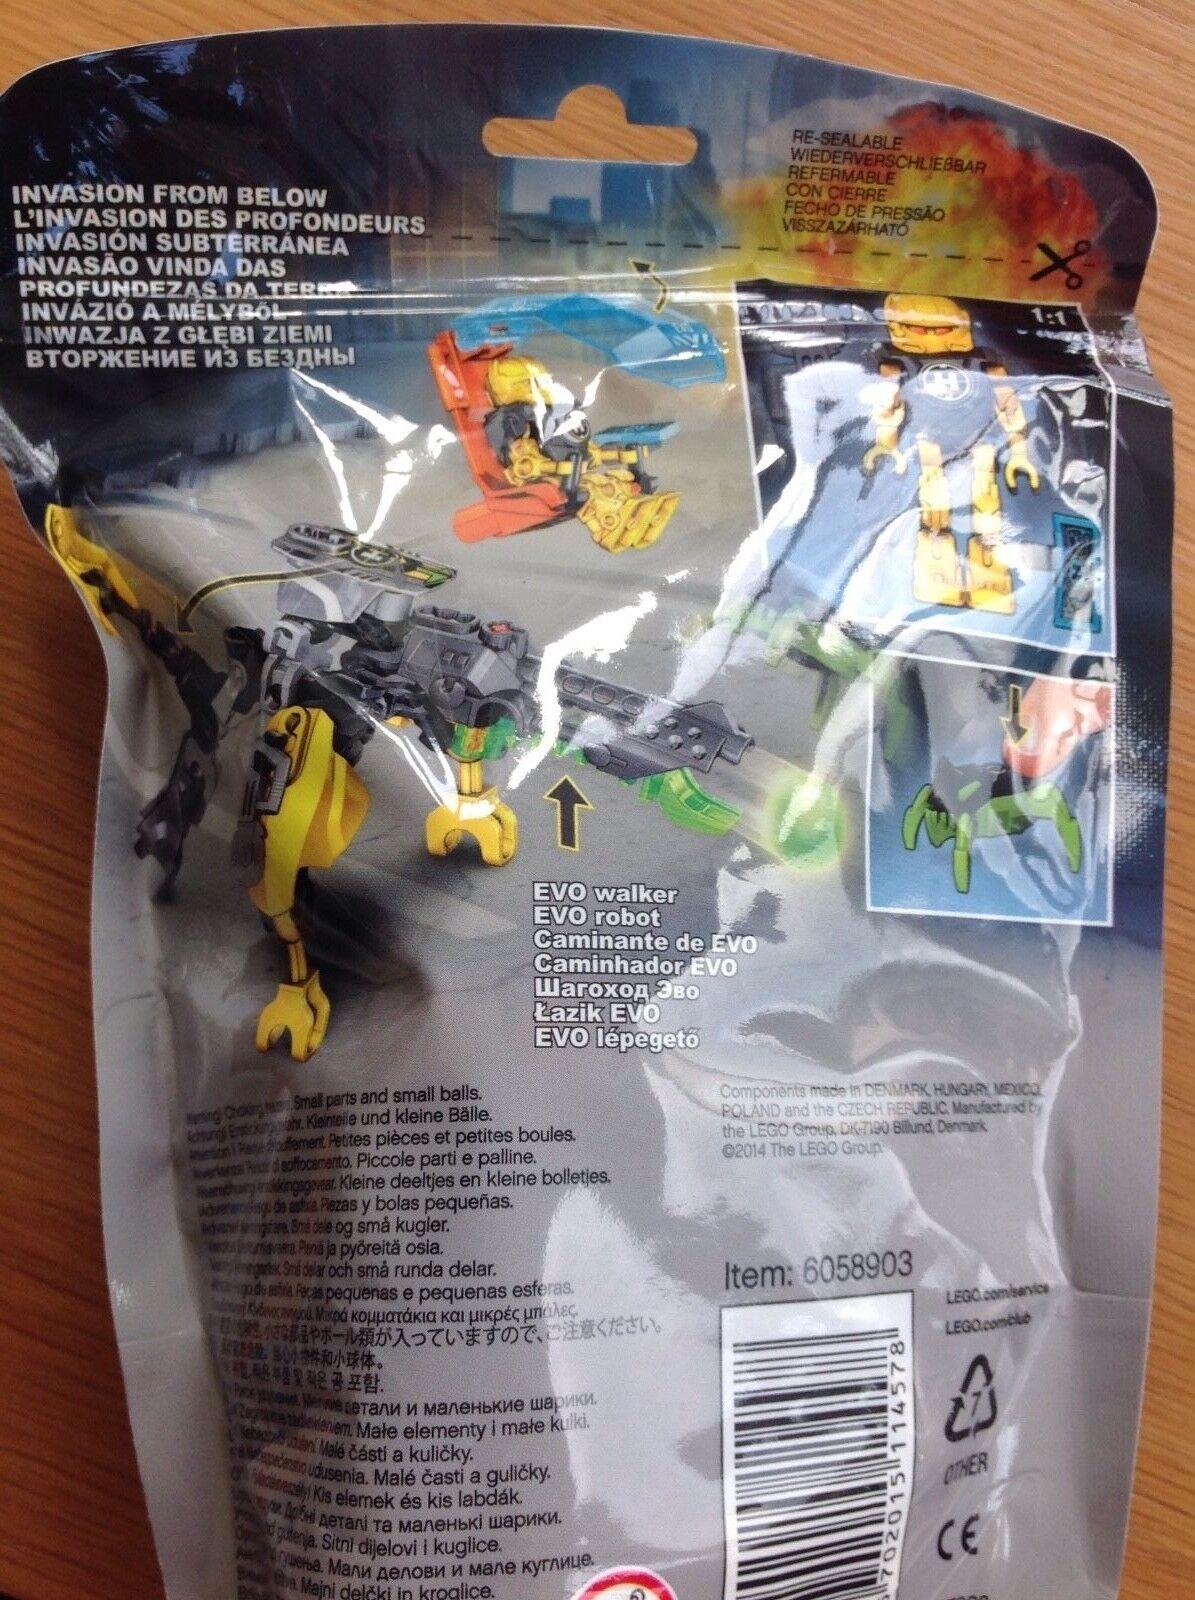 NEW LEGO 44015 Hero Factory Evo Walker Robot Invasion Invasion Invasion from Below e72227